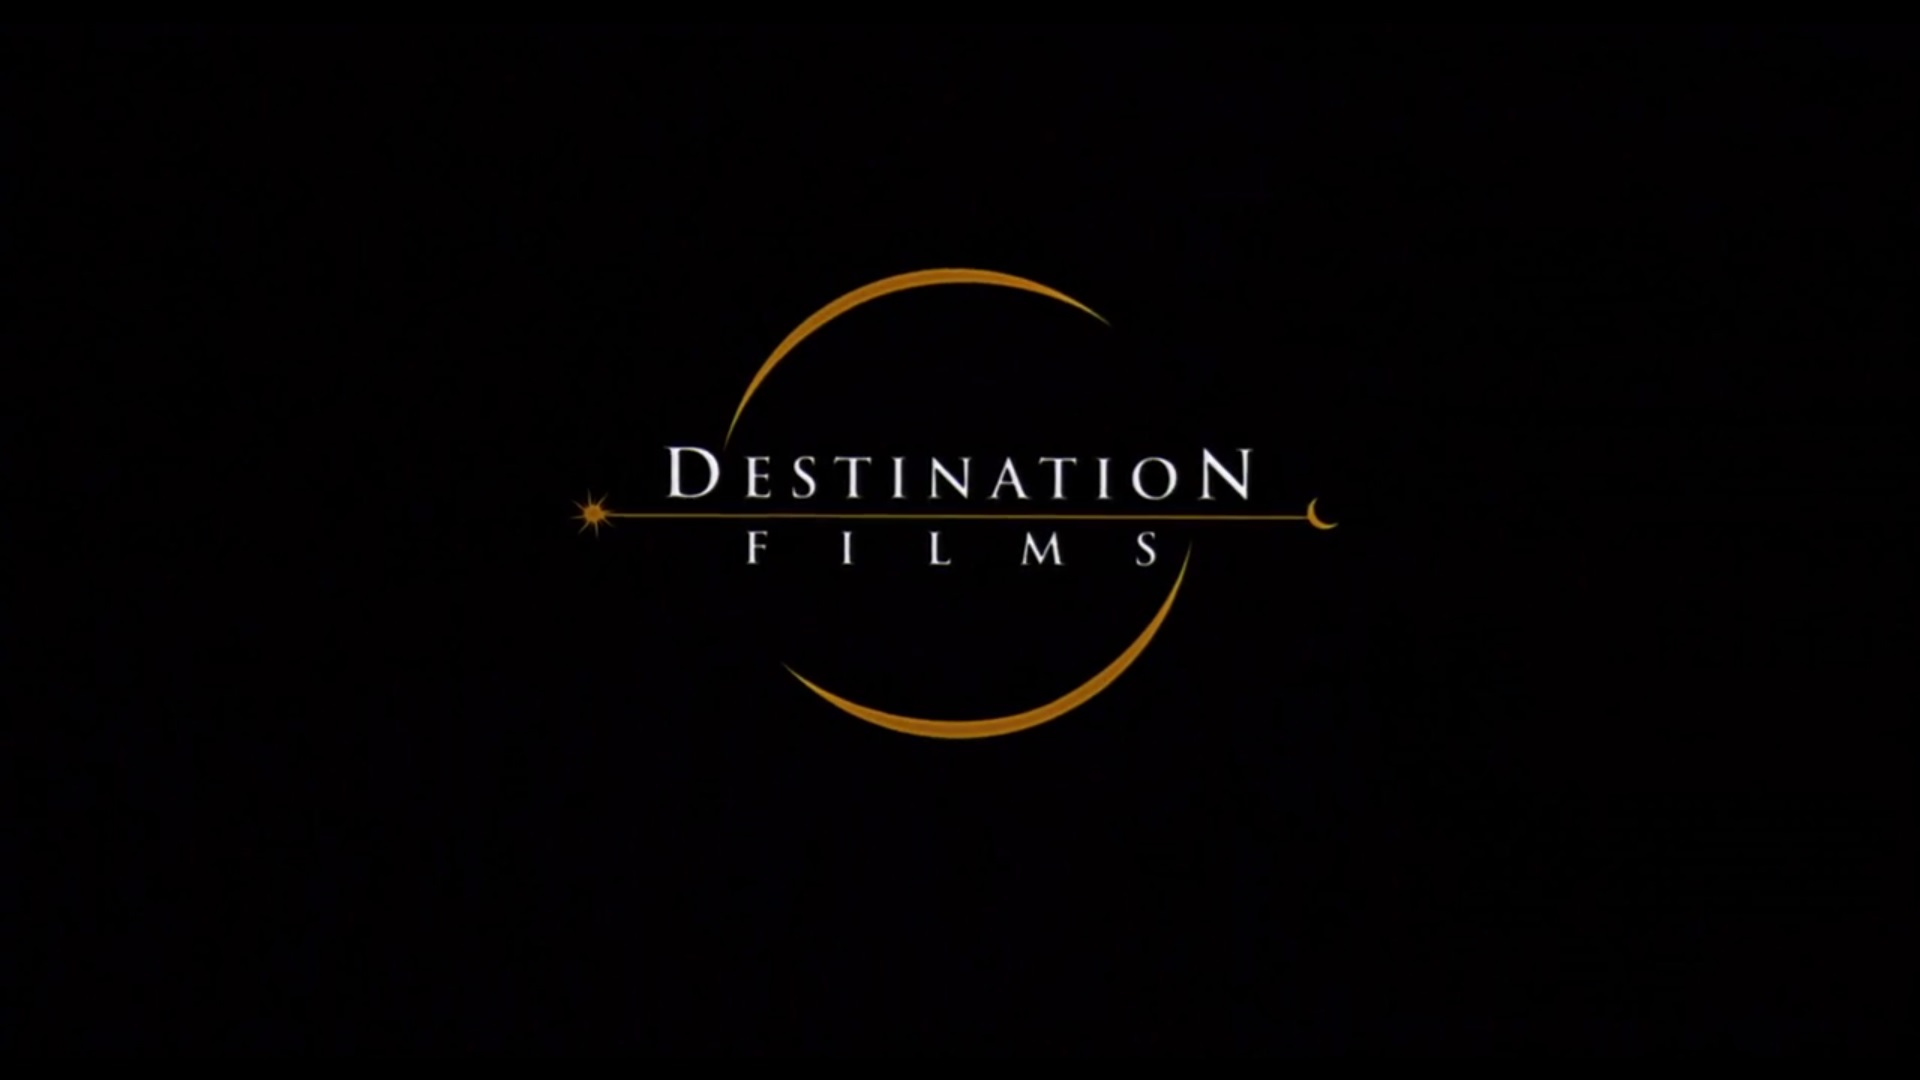 File:DestinationFilmslogo.jpg